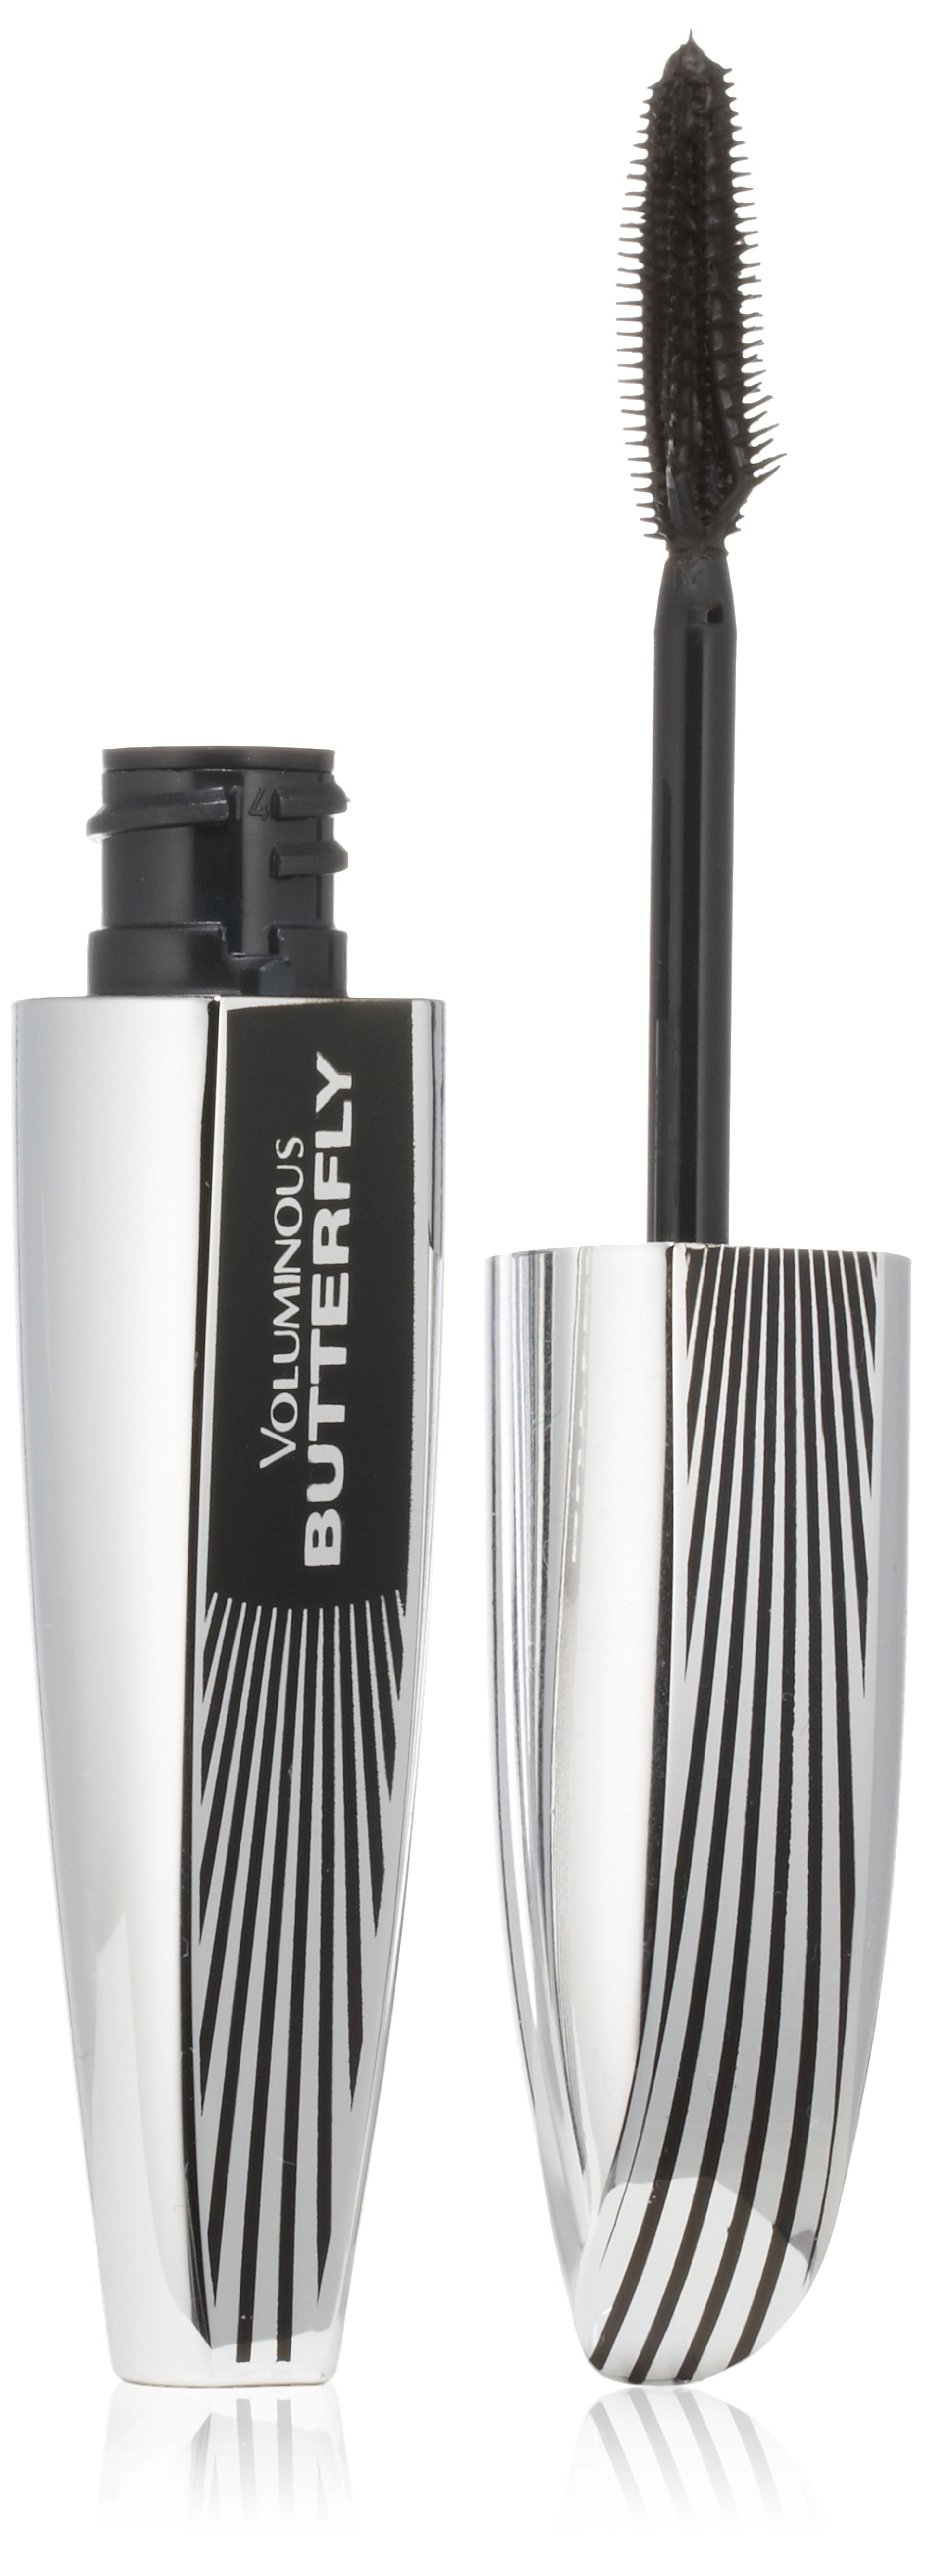 L'Oréal Paris Voluminous Butterfly Lengthening Washable Mascara, Blackest Black, 0.22 fl. oz.